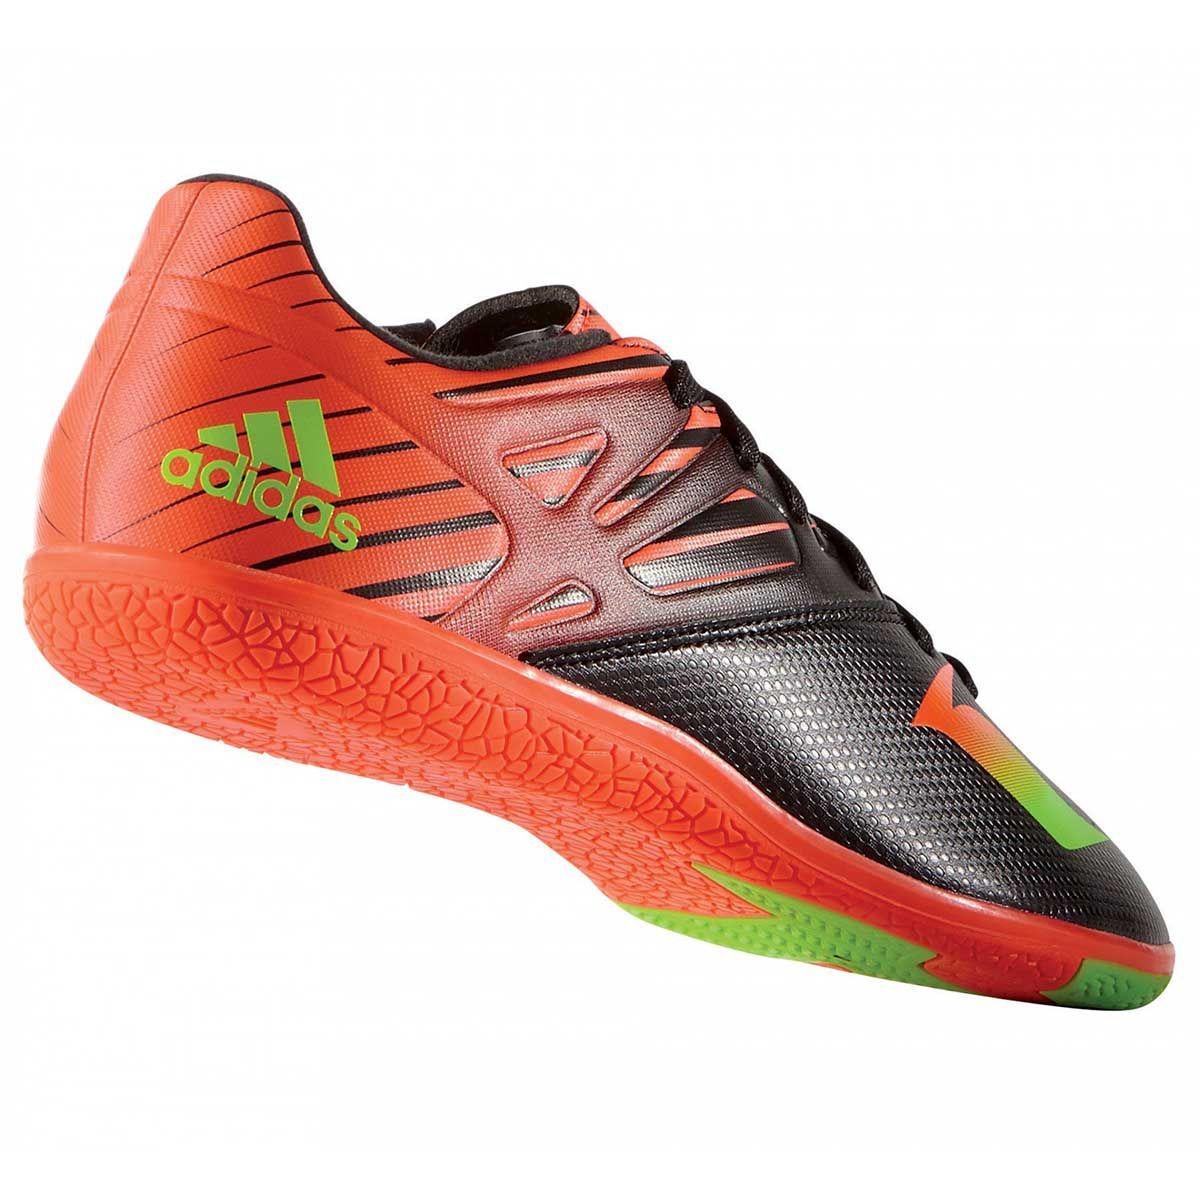 chuteira tênis de futsal adidas messi 15.3 origianl+ nf. Carregando zoom. 5d0357aadf0e6